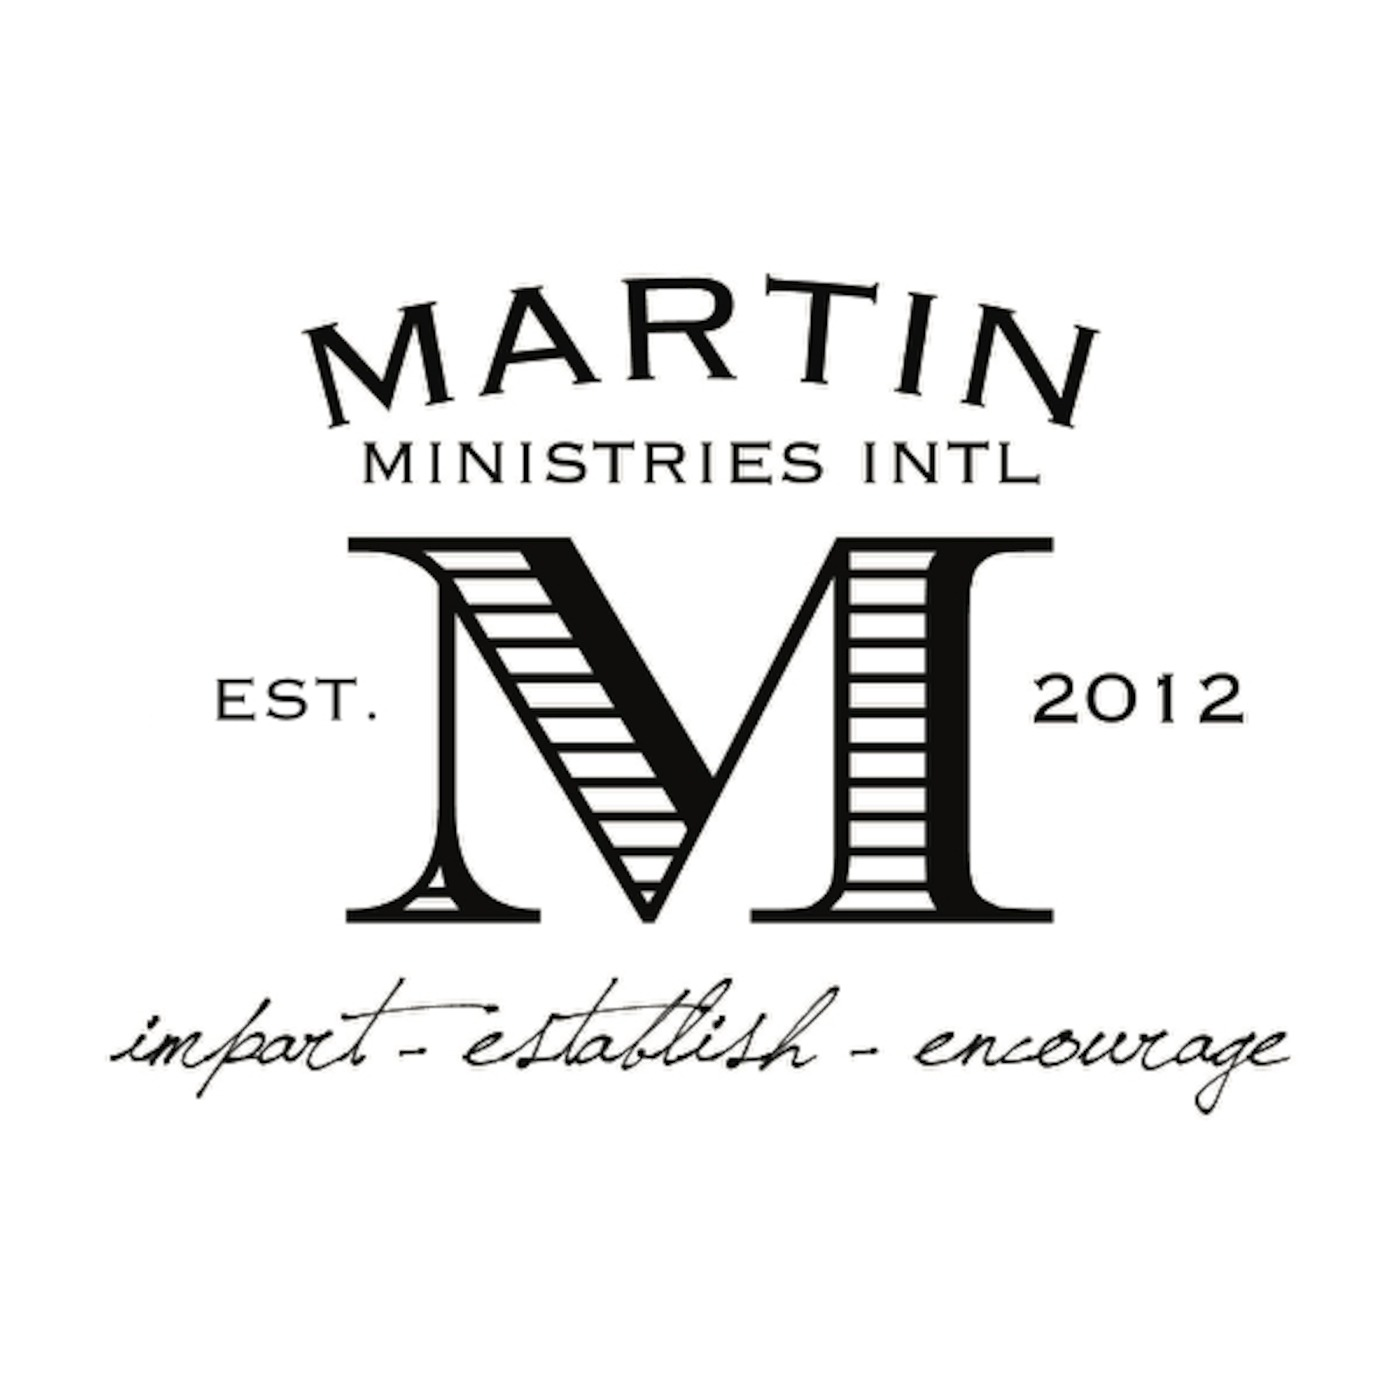 Martin Ministries International